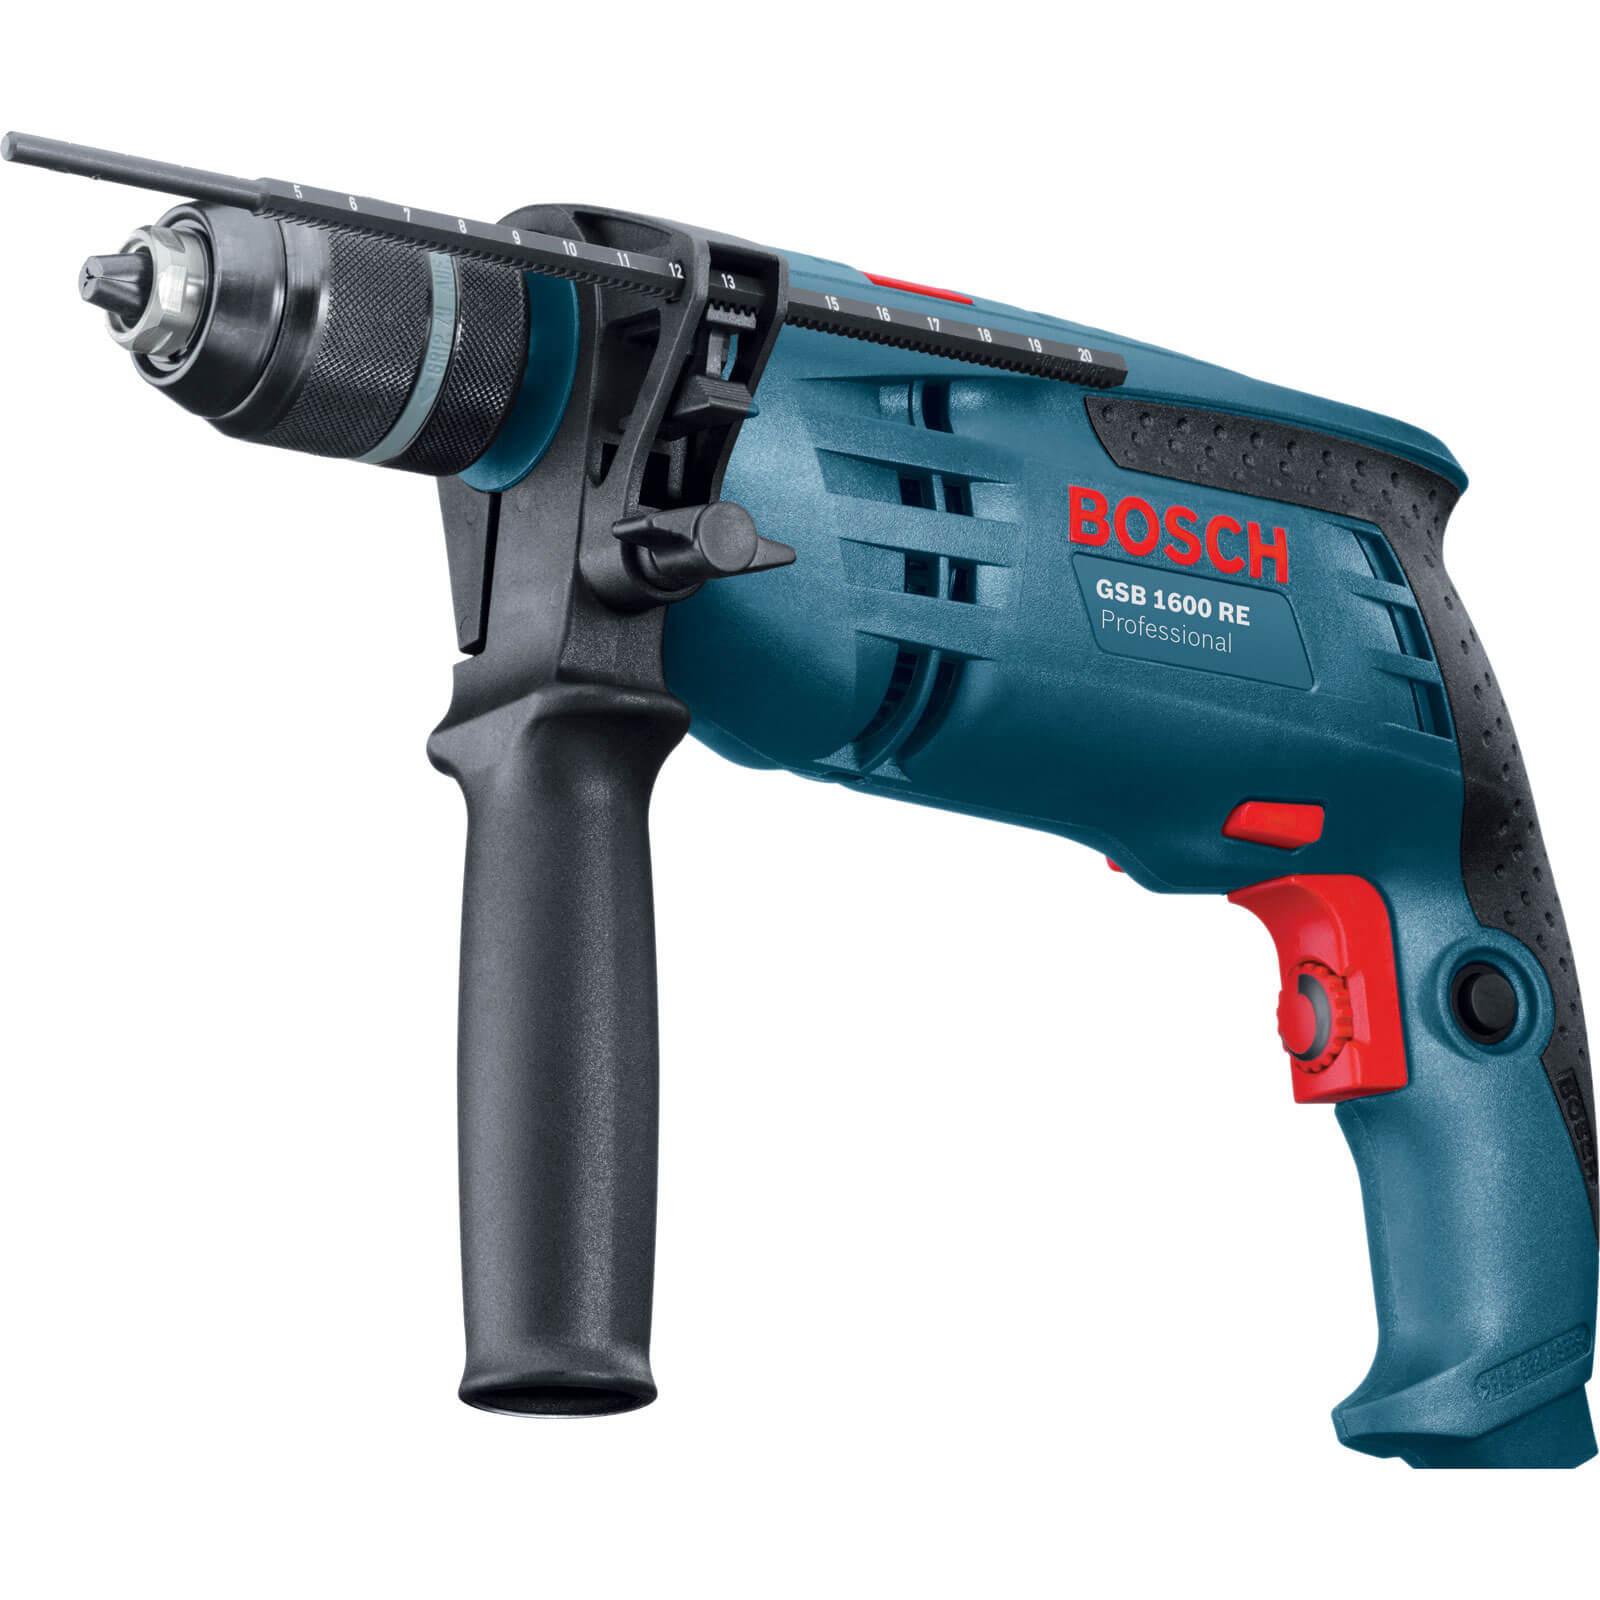 Bosch GSB 1600RE Hammer Drill 700w 110v